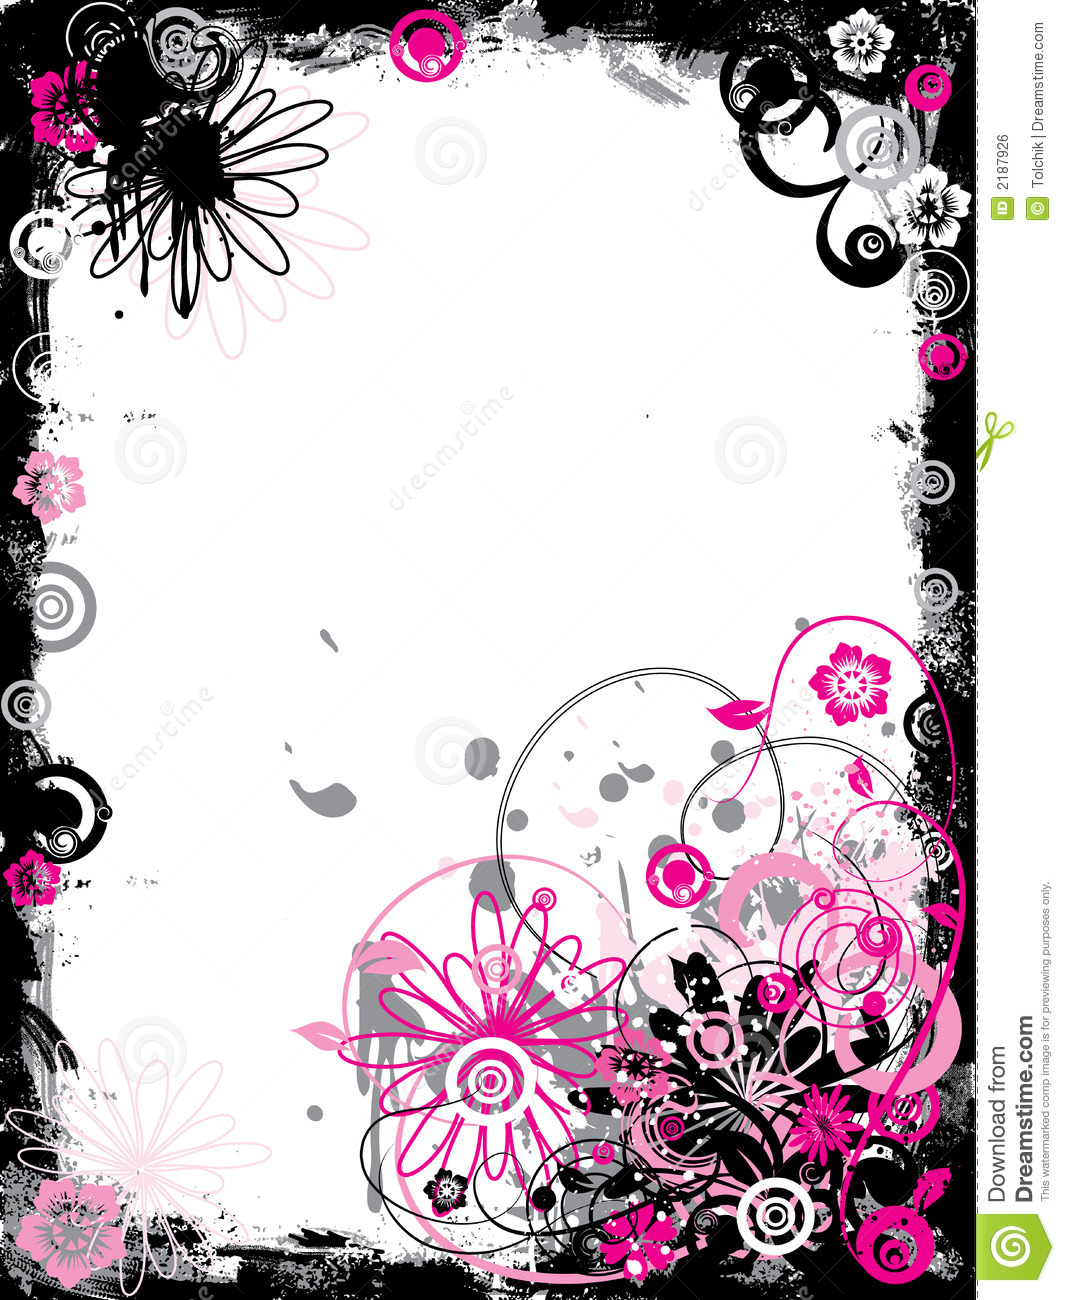 18 Flower Border Vector Images